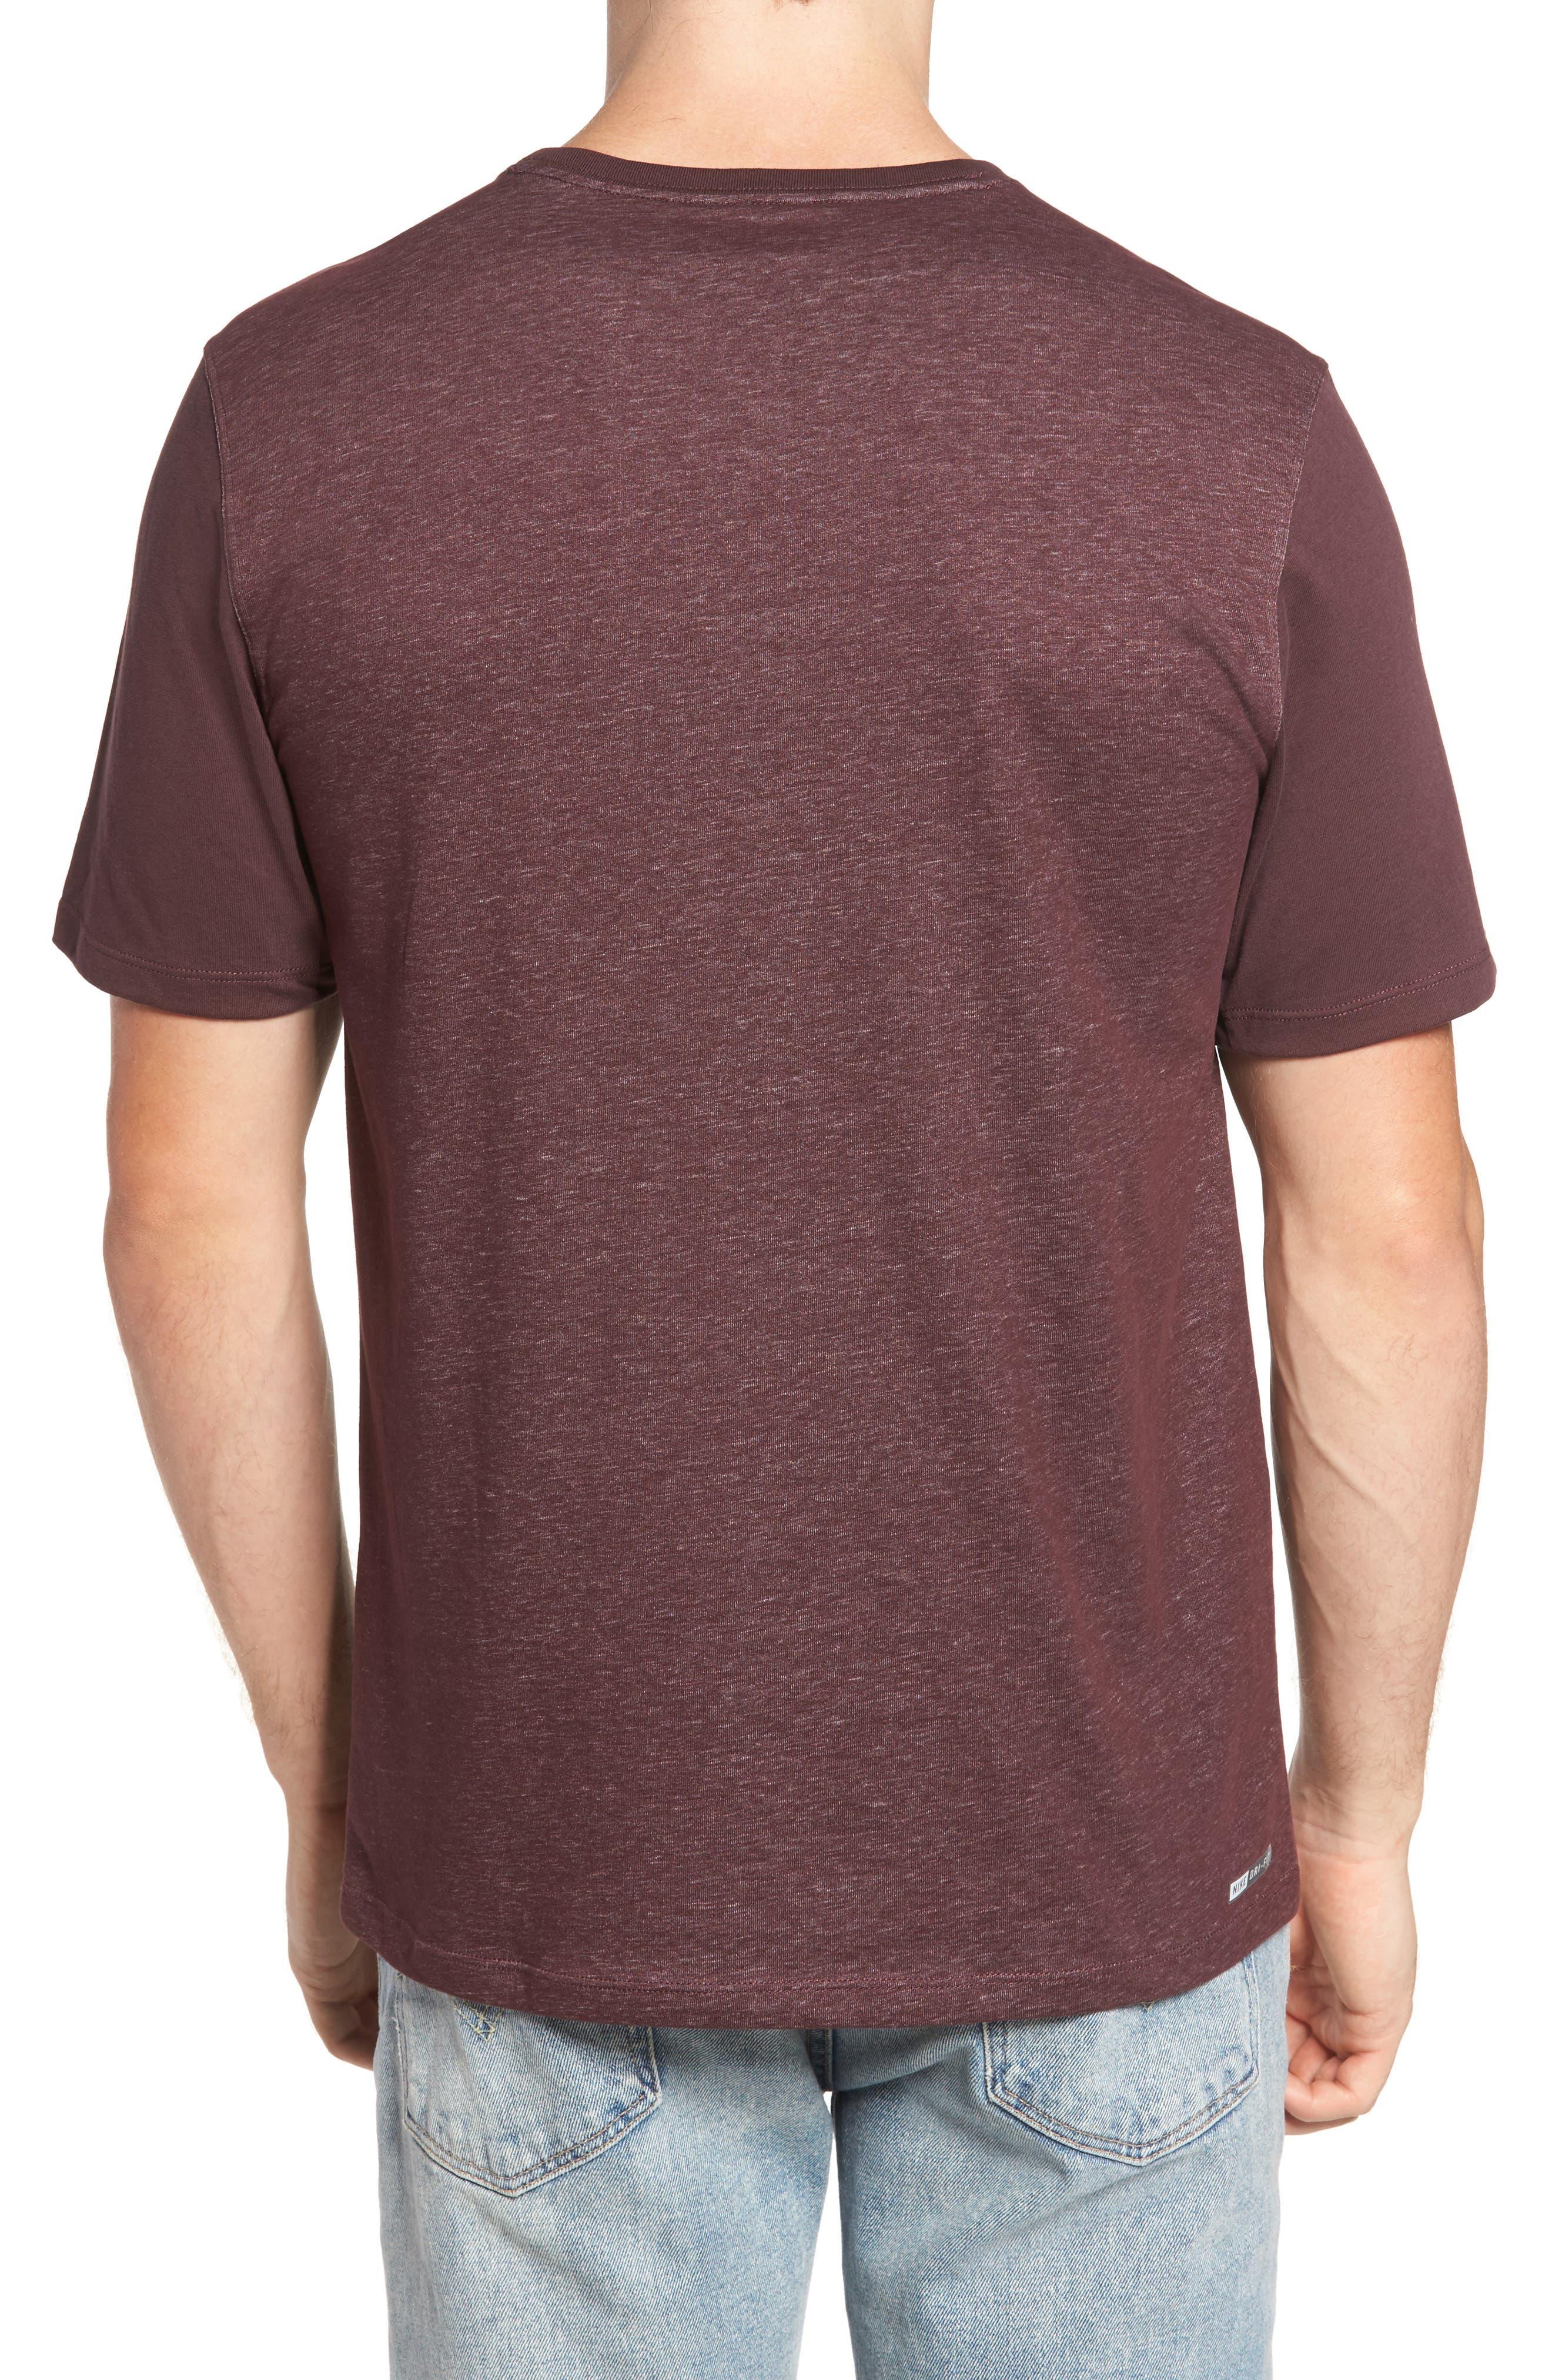 Lagos Snapper Dri-FIT T-Shirt,                             Alternate thumbnail 6, color,